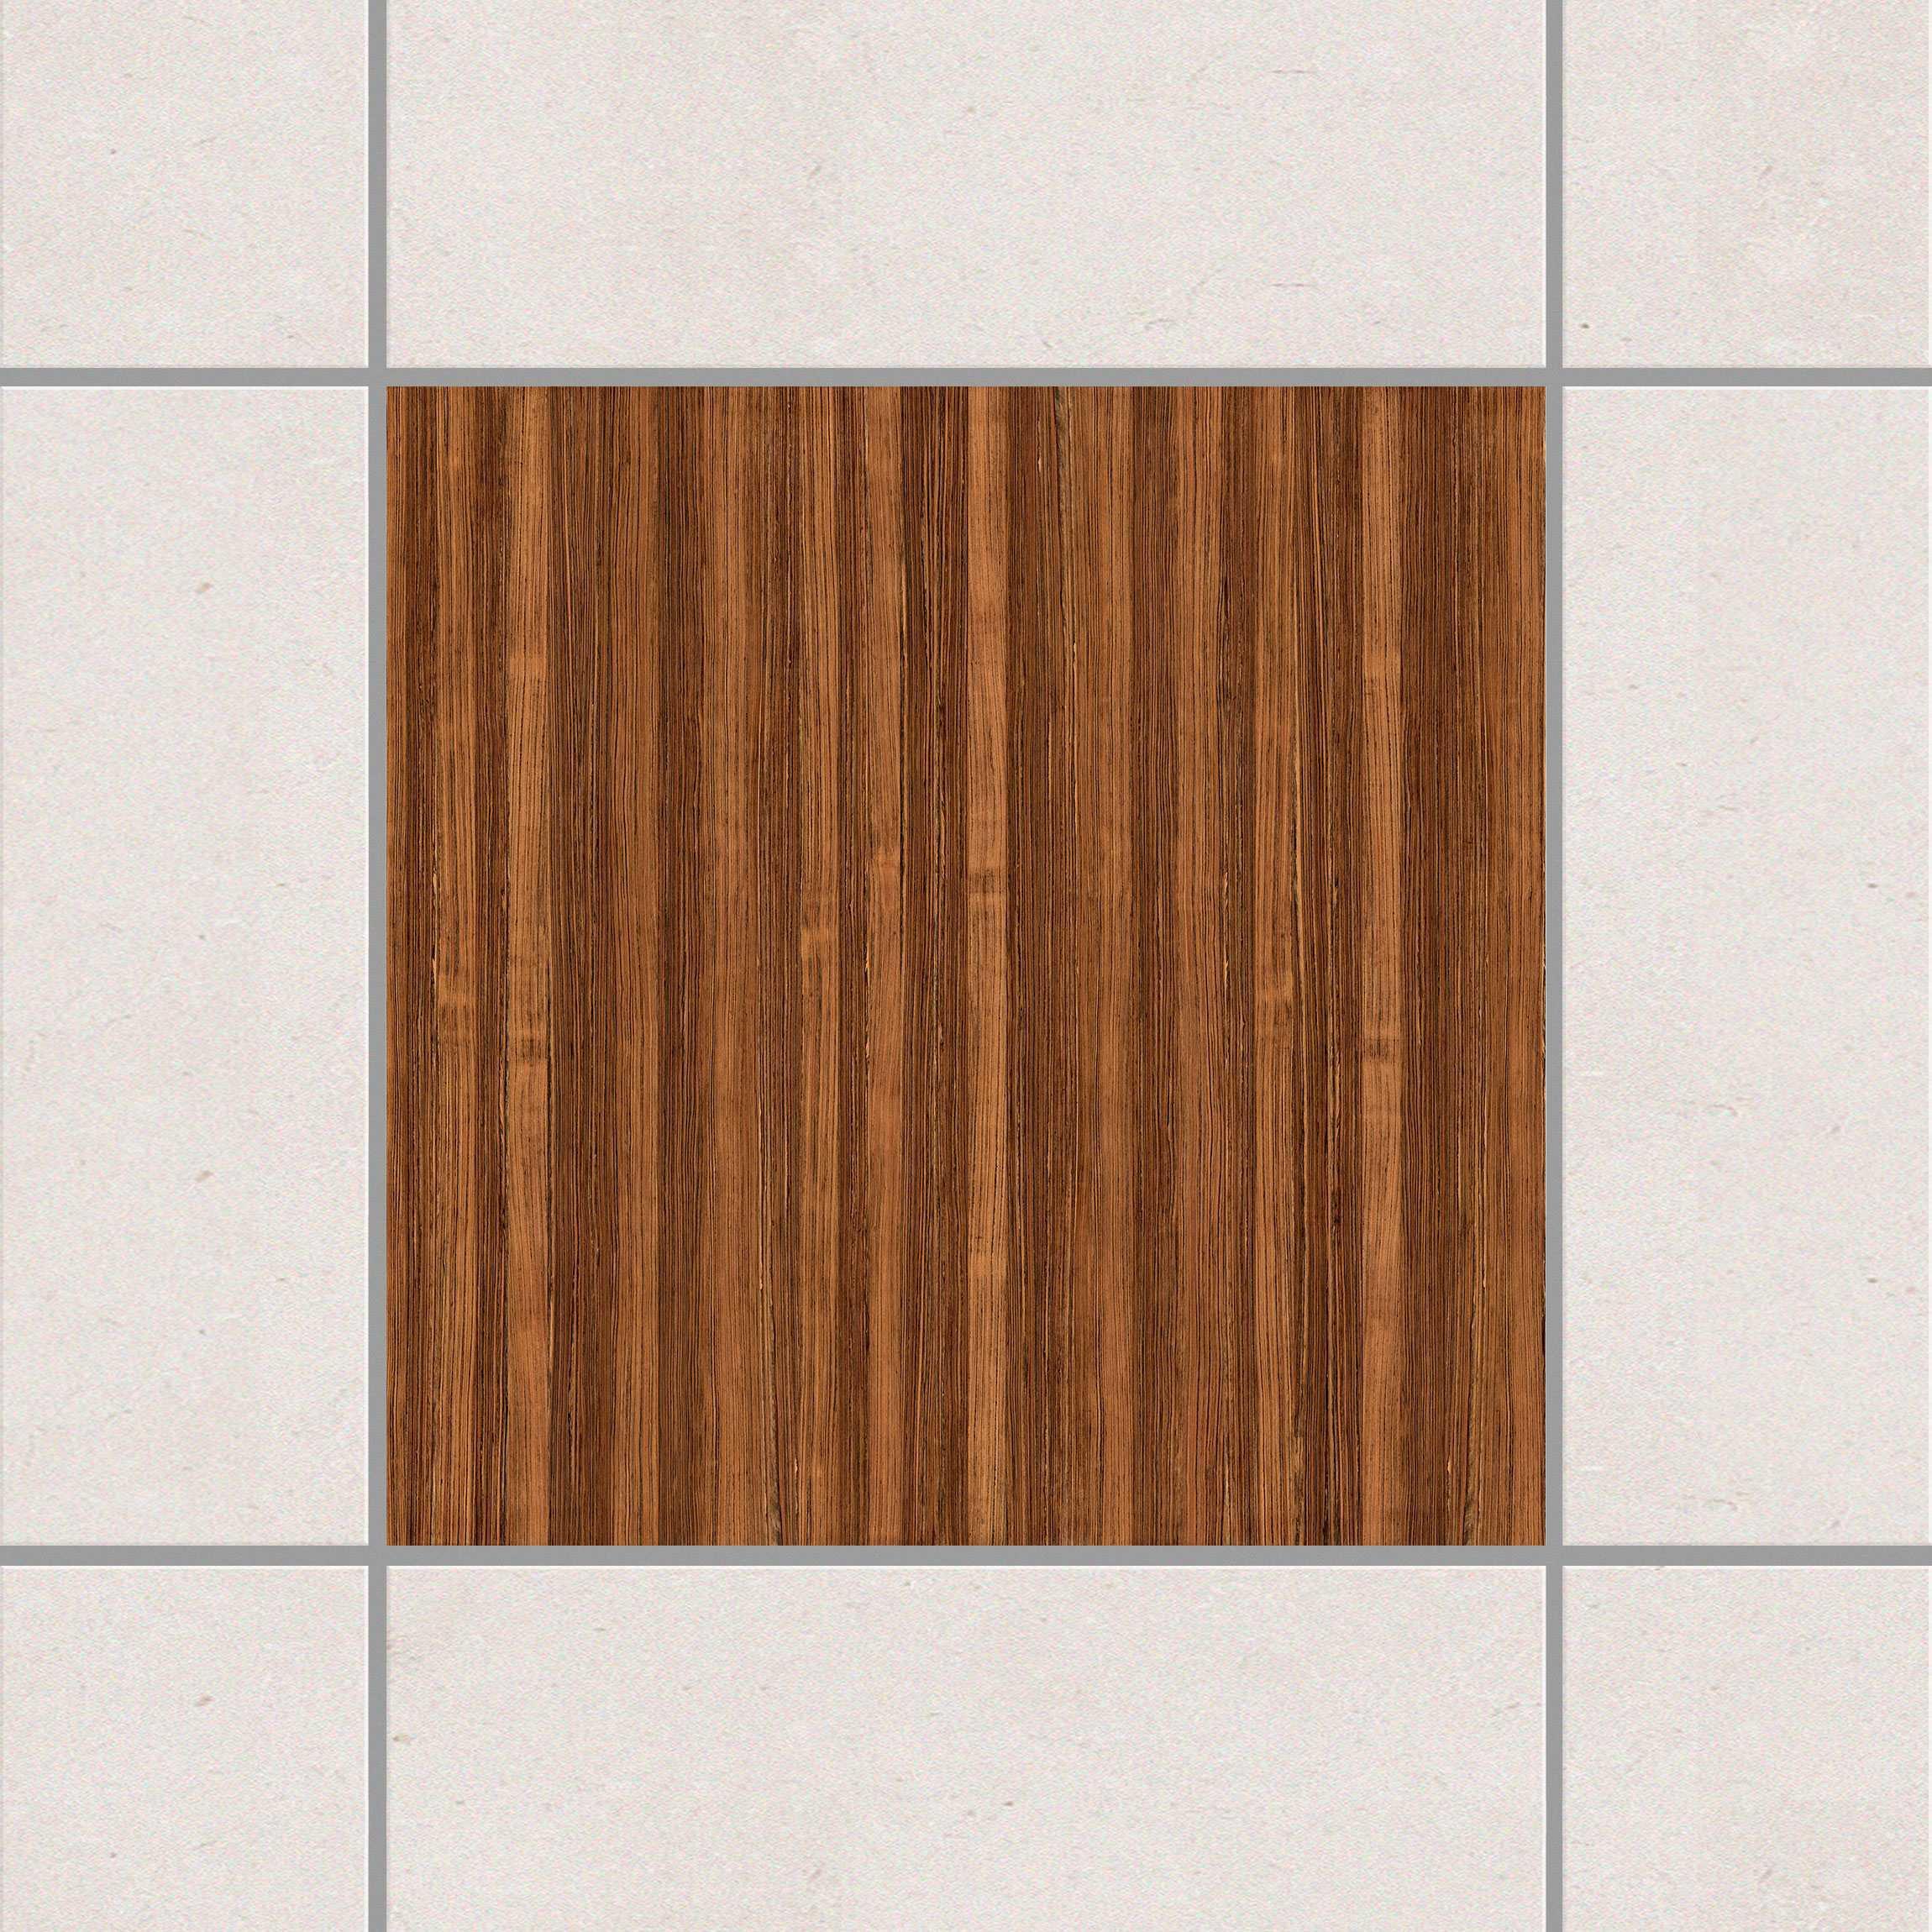 Fliesenaufkleber amazakou 15x15 cm fliesensticker set for Fliesensticker 15x15